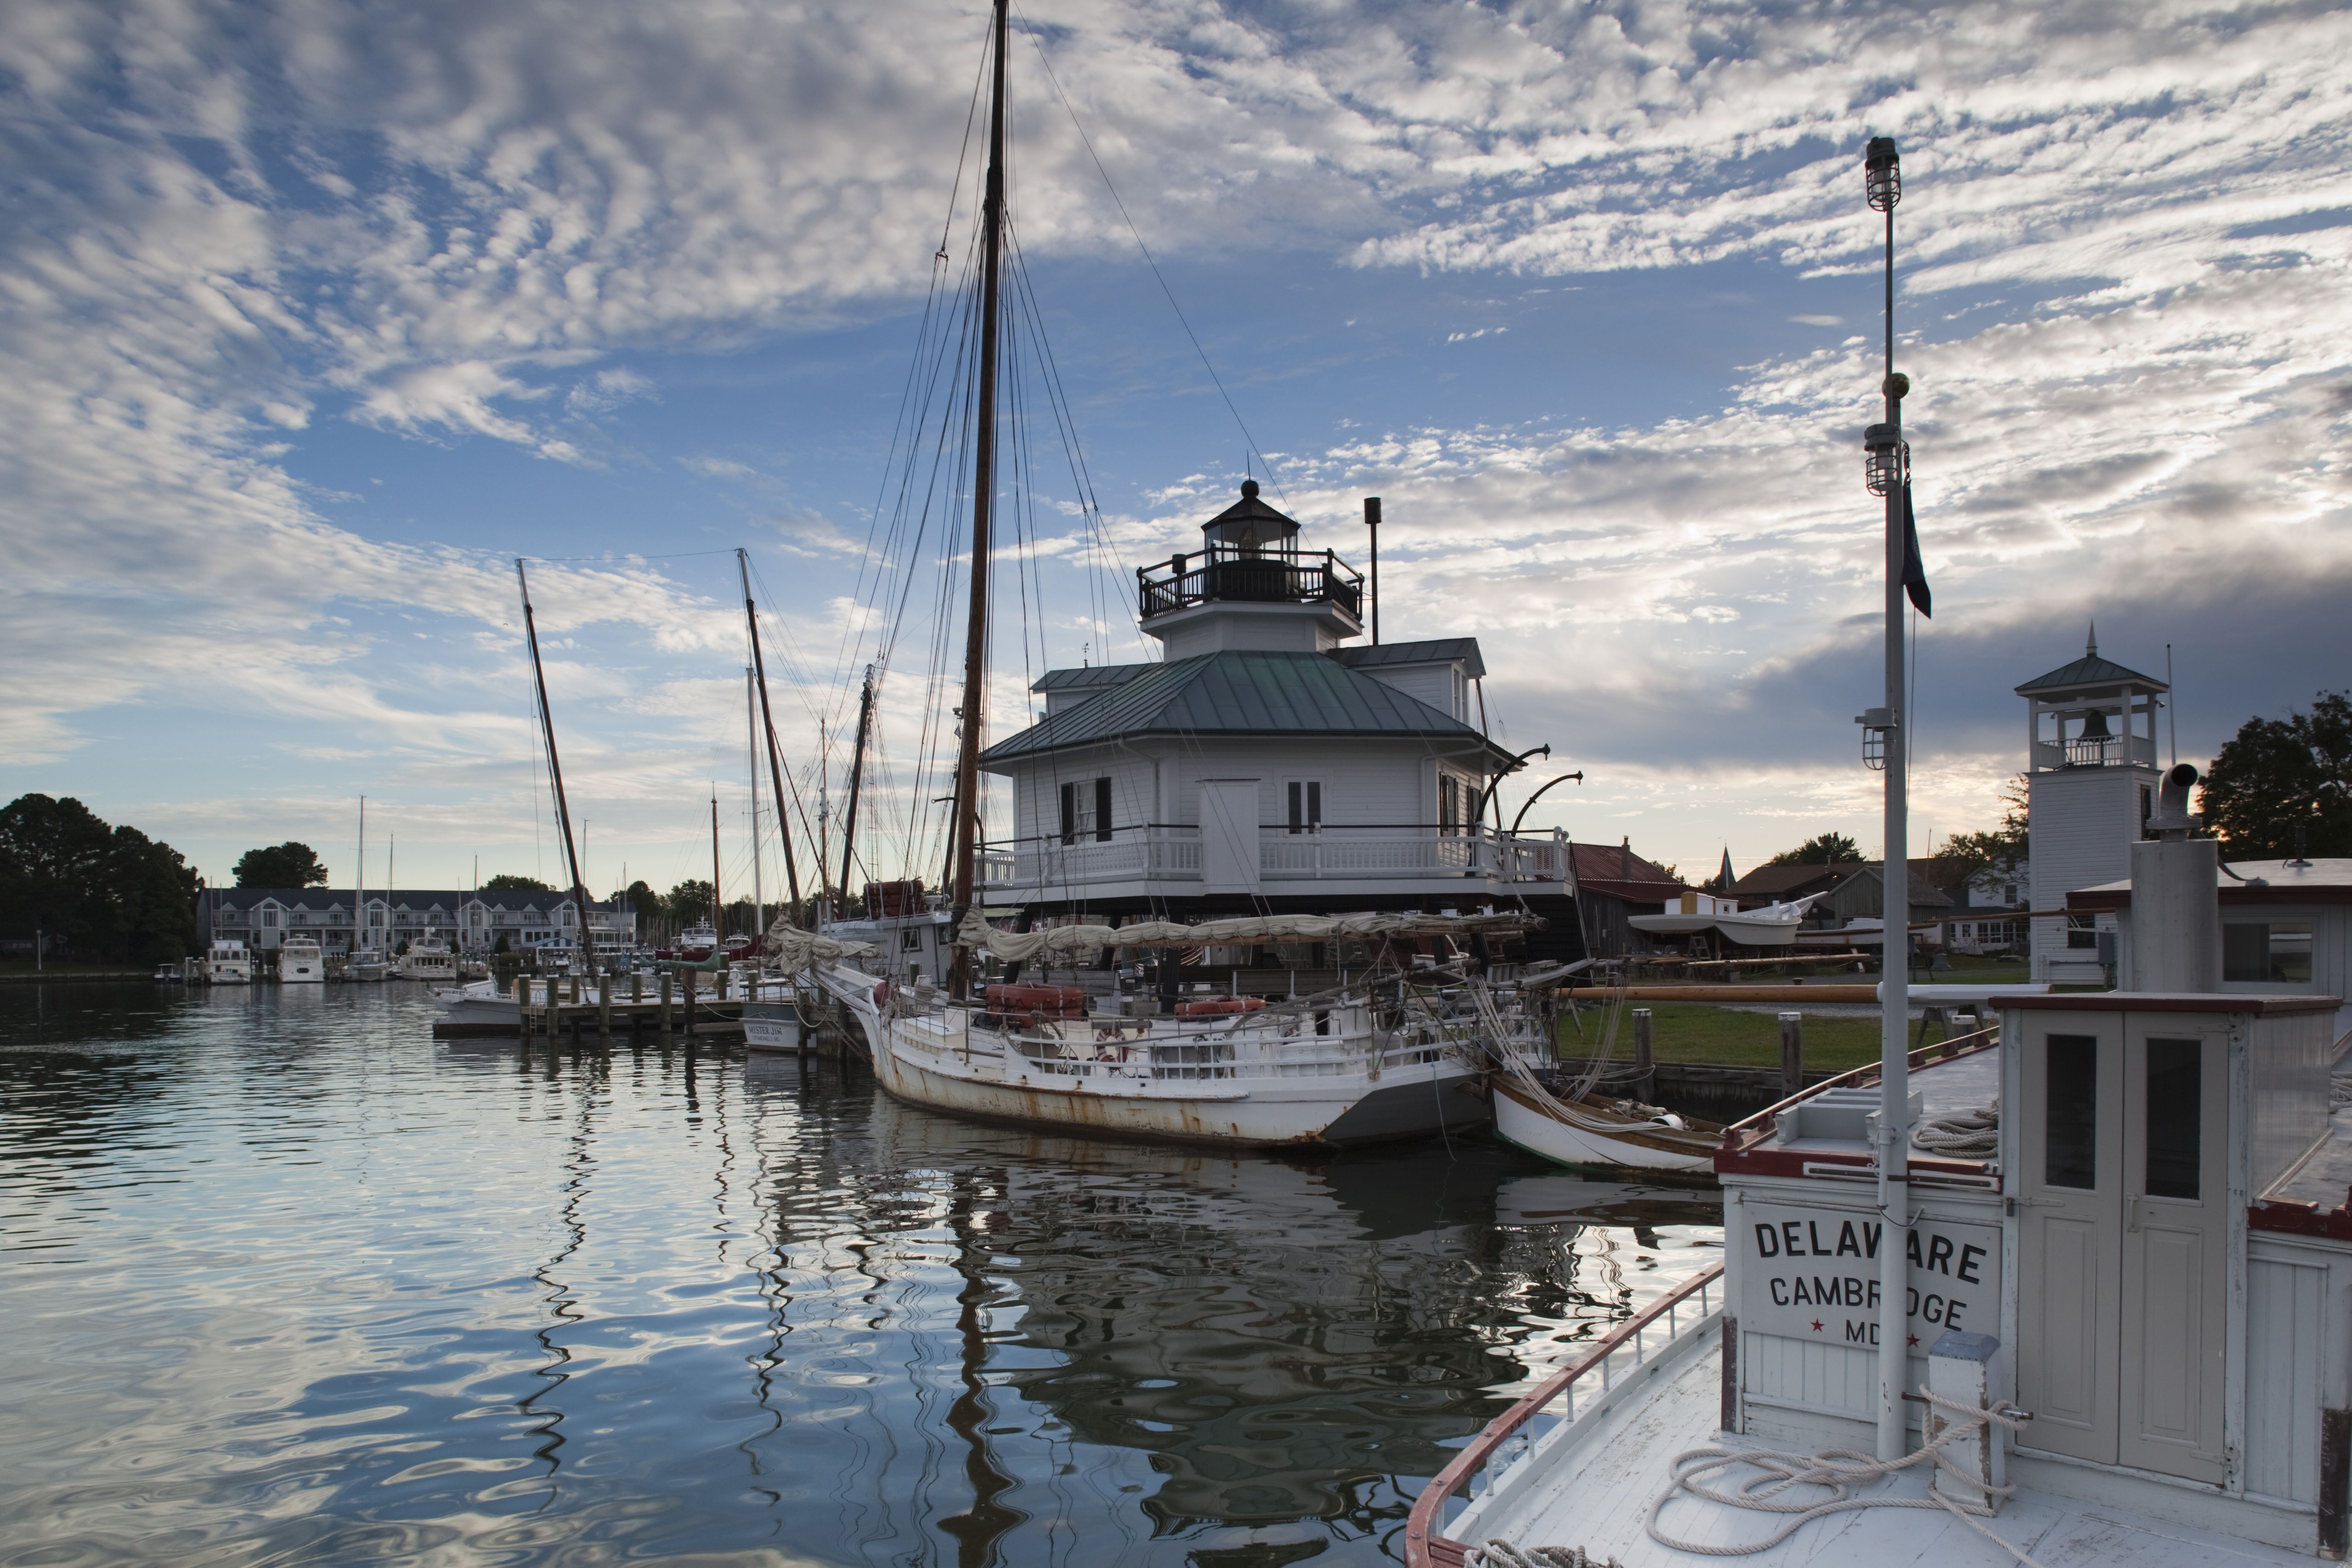 Hooper Straight Lighthouse at dawn, Chesapeake Bay Maritime Museum, St. Michaels, Eastern Shore of Chesapeake Bay, Maryland, USA